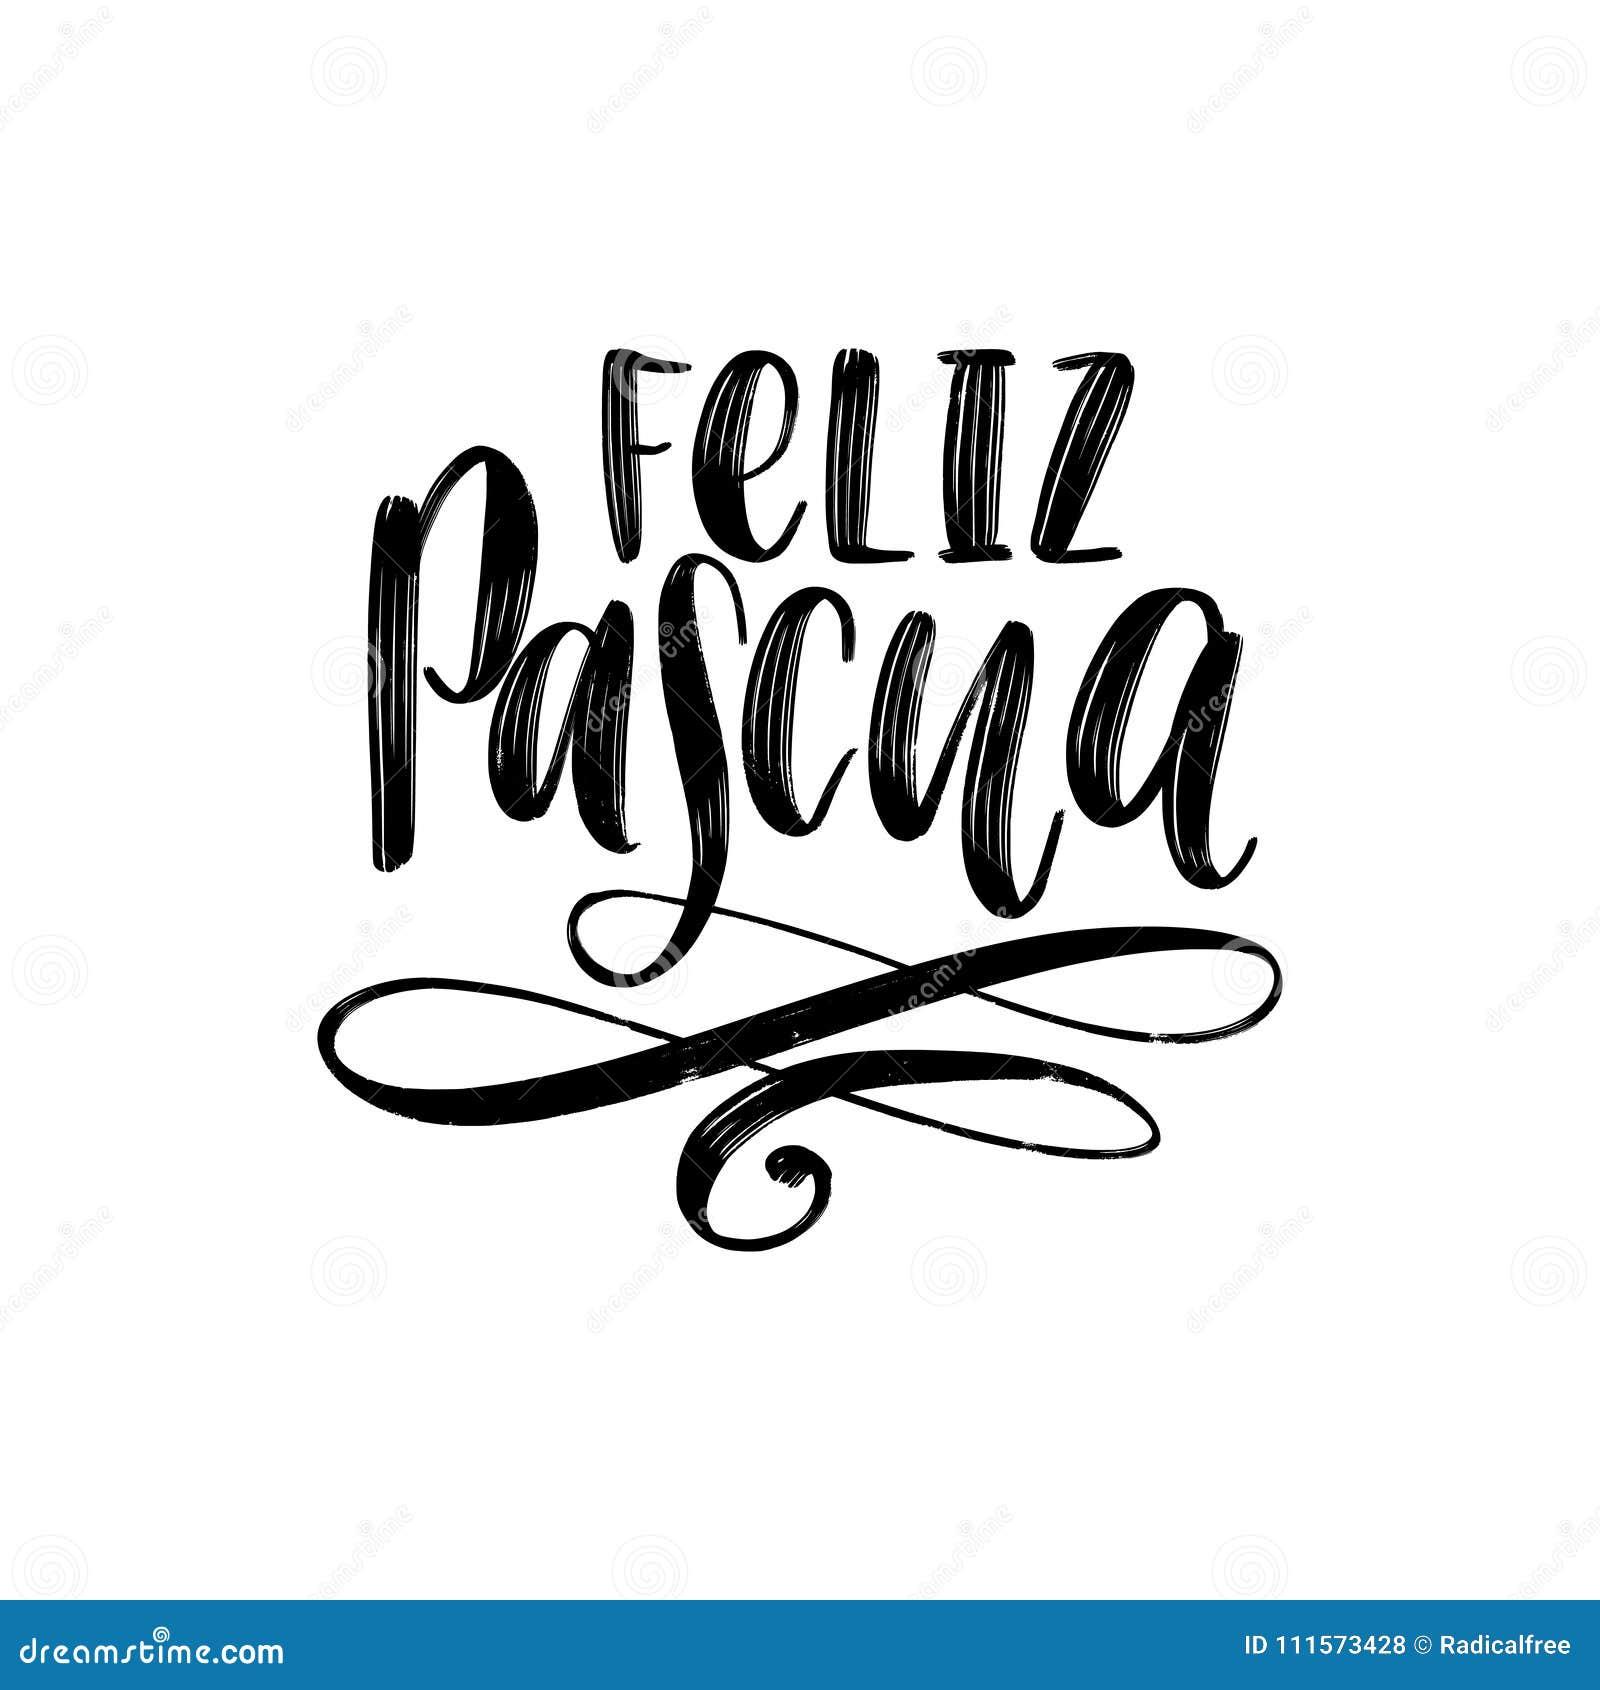 Feliz Pascua Translated From Spanish Handwritten Phrase Happy Easter